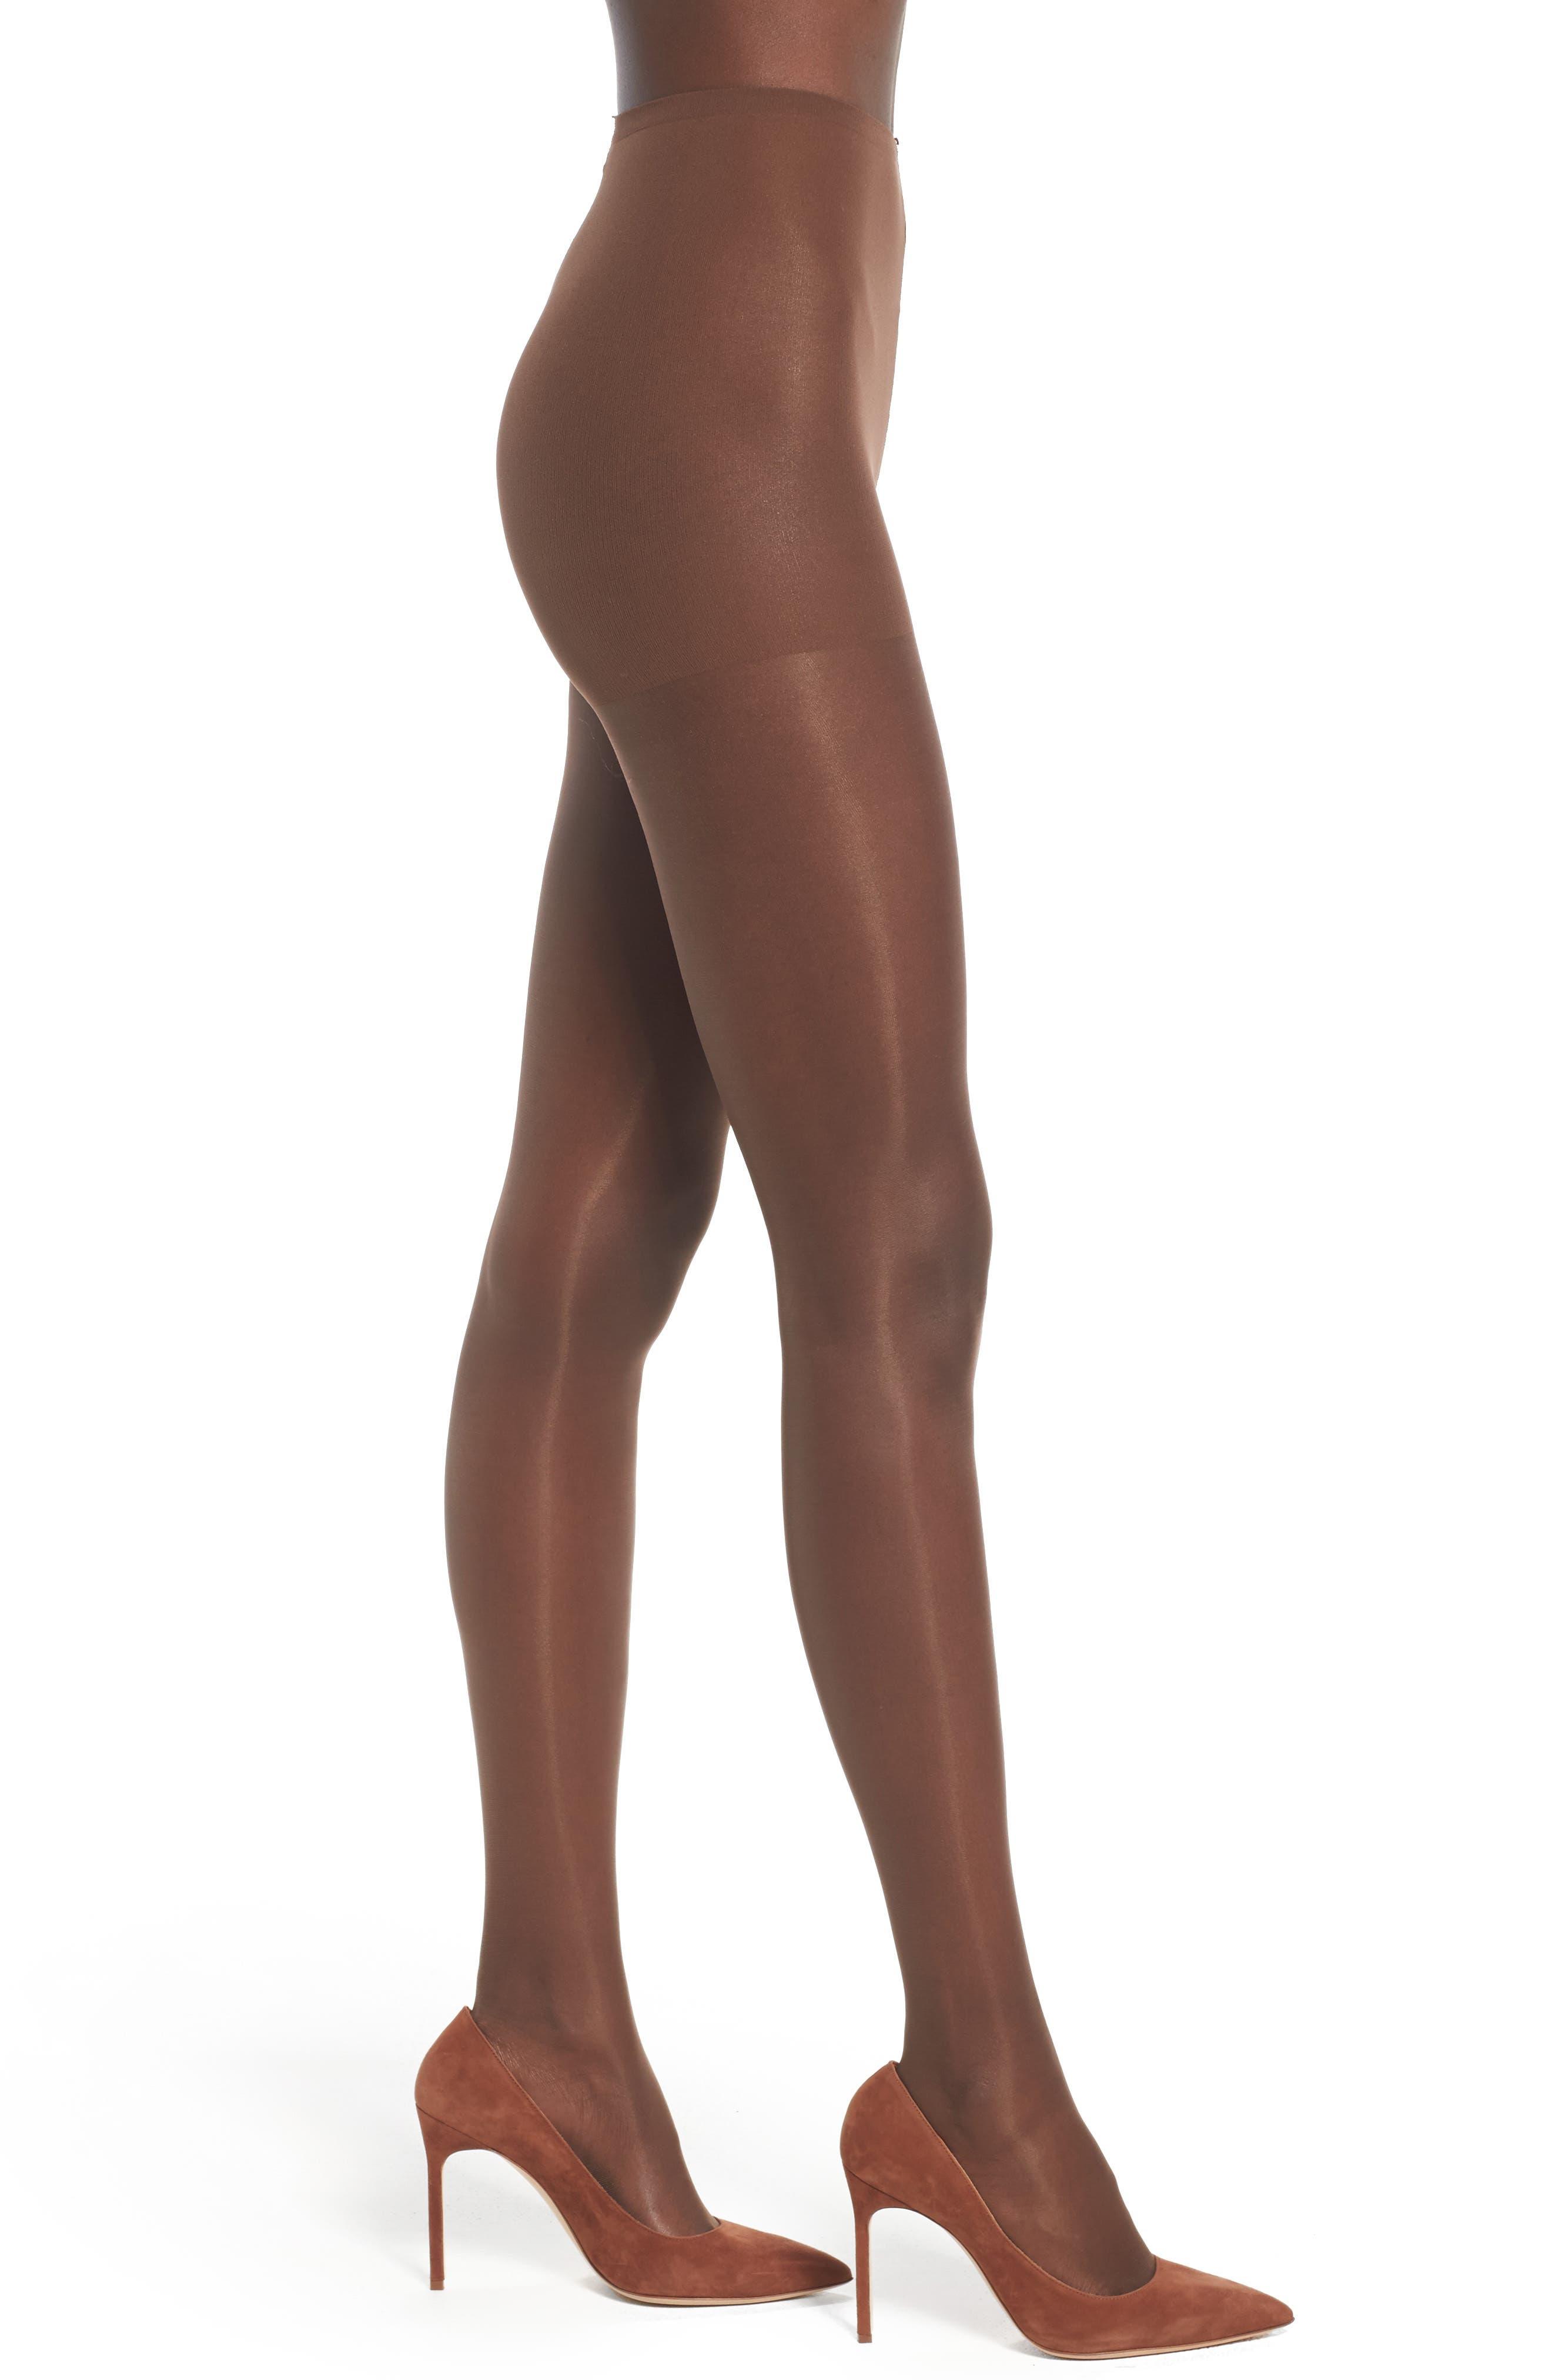 NUBIAN SKIN Glossy Sheer Pantyhose, Main, color, 200